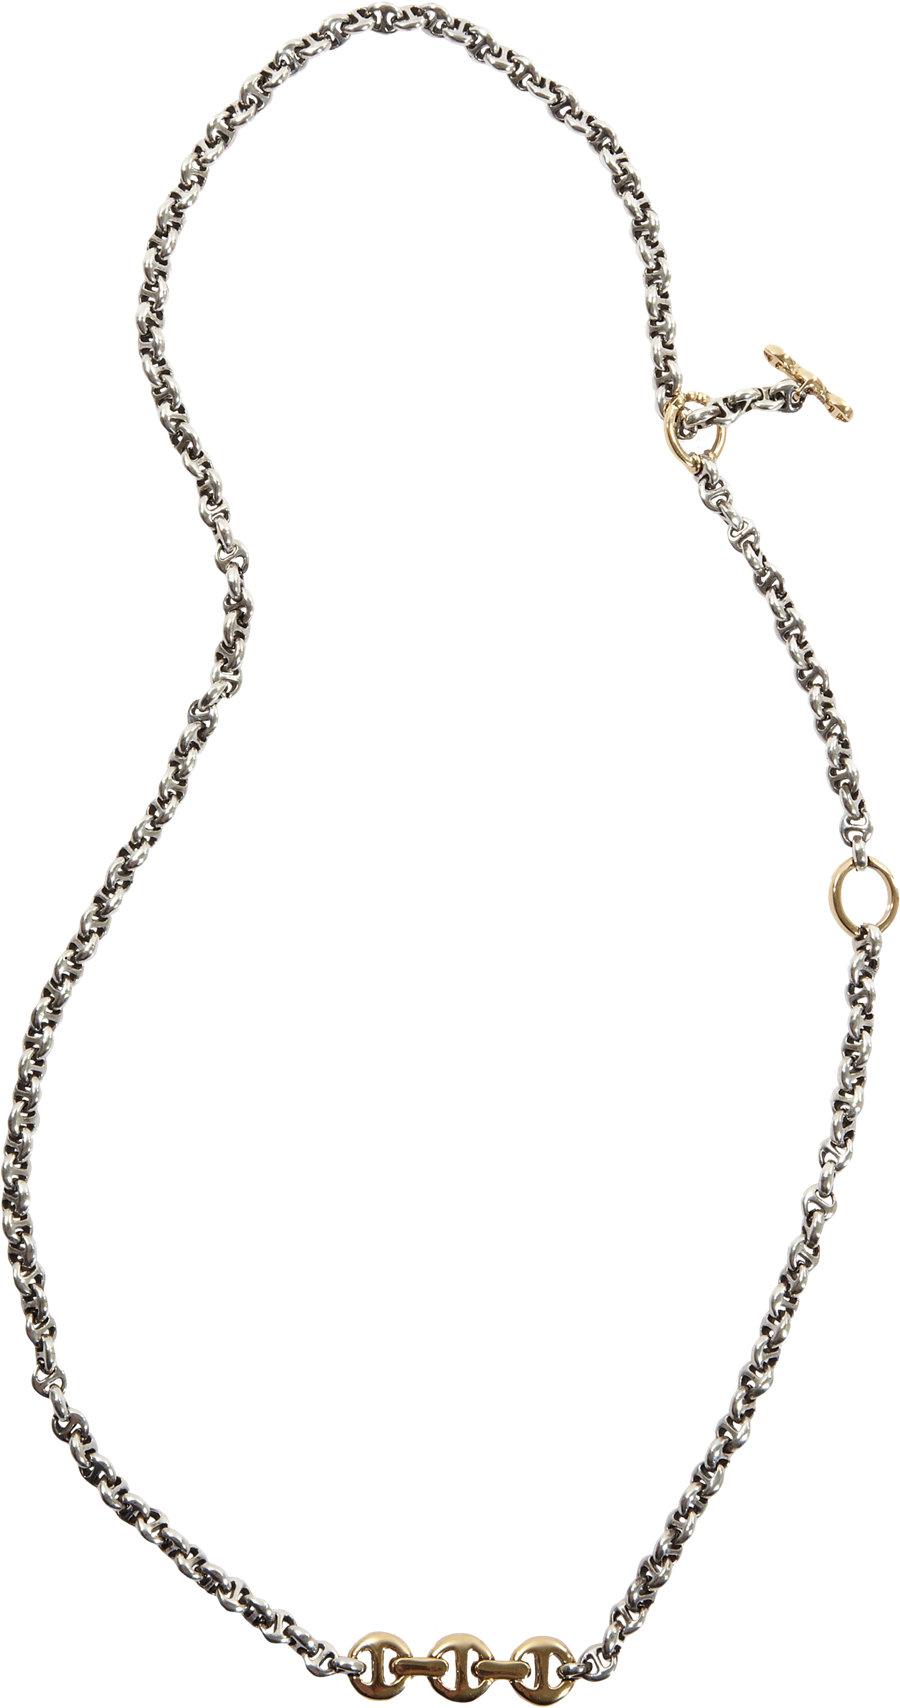 Hoorsenbuhs 3Mm Mini Open-Link 16 Necklace h0QIsl6